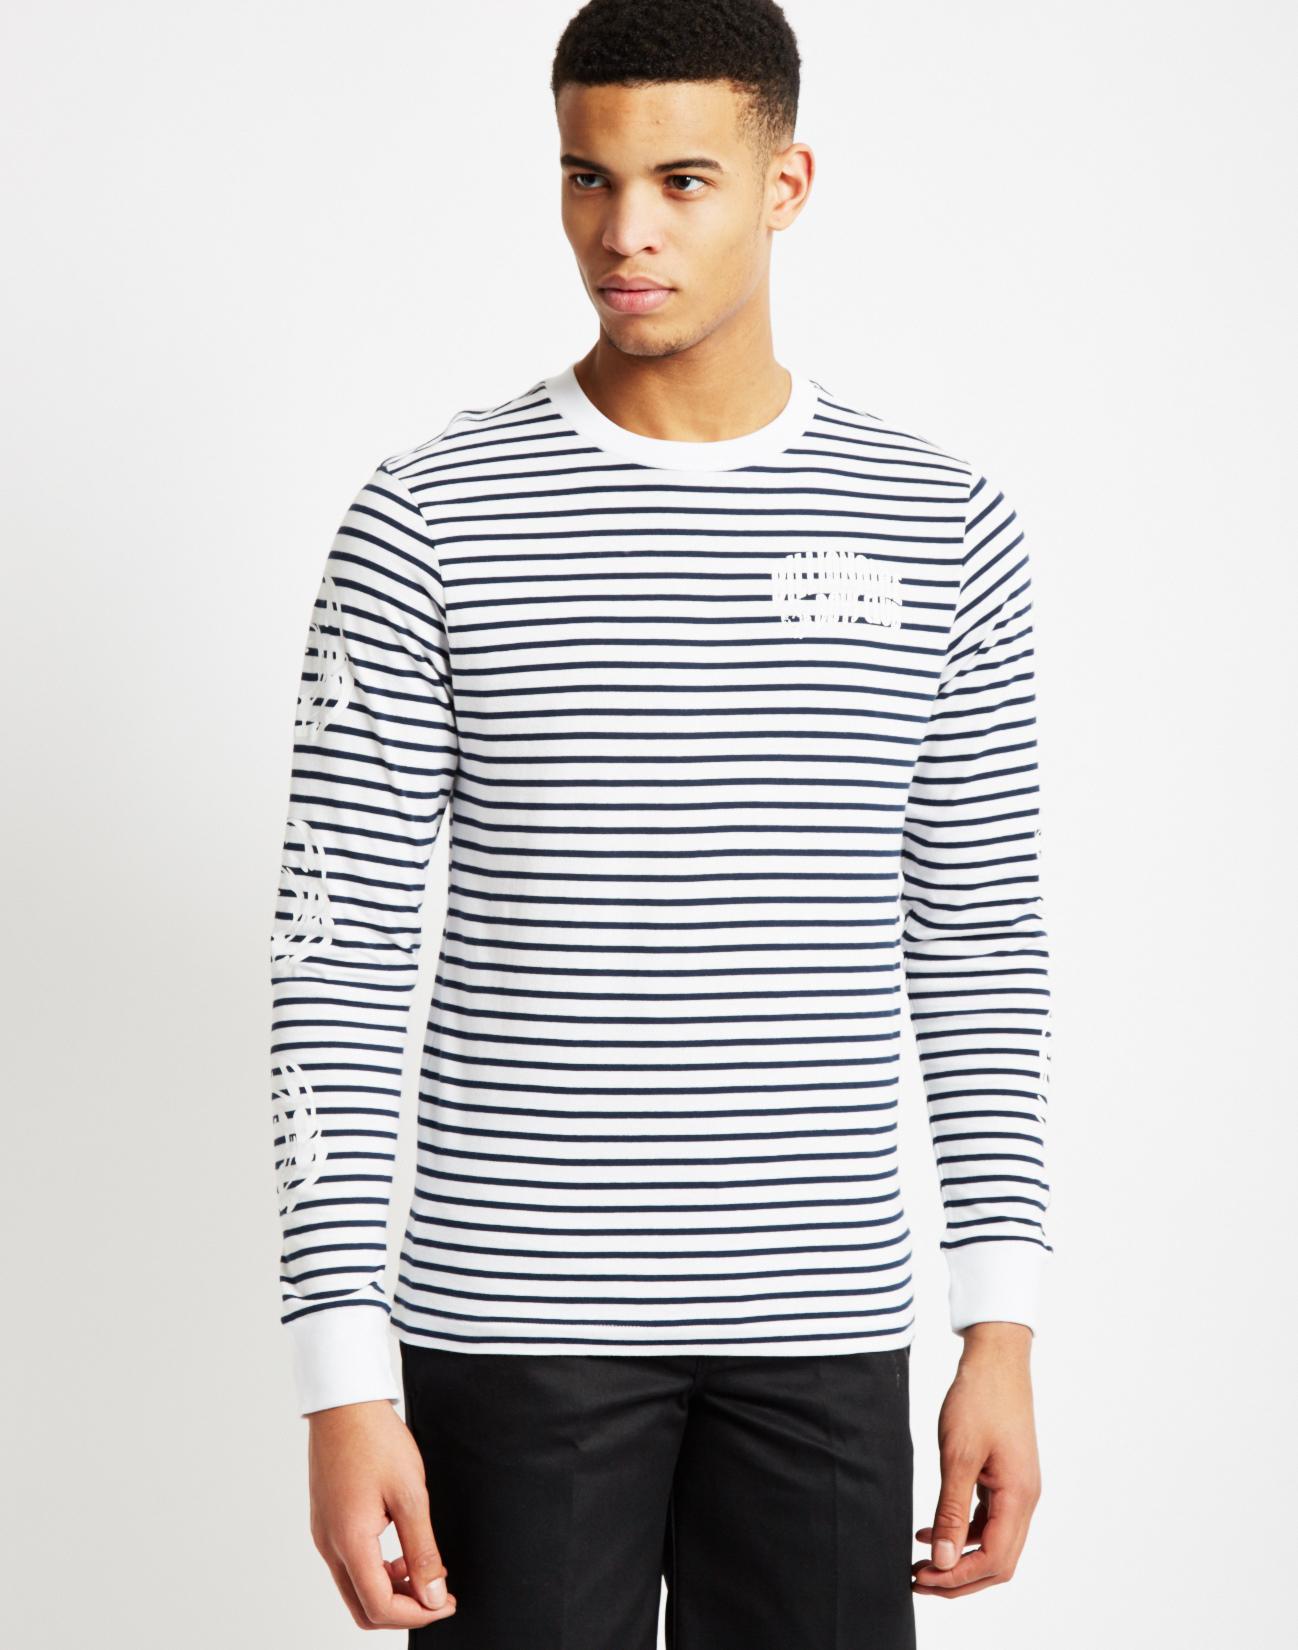 Billionaire boys club ice cream striped long sleeve t for Navy blue striped long sleeve shirt